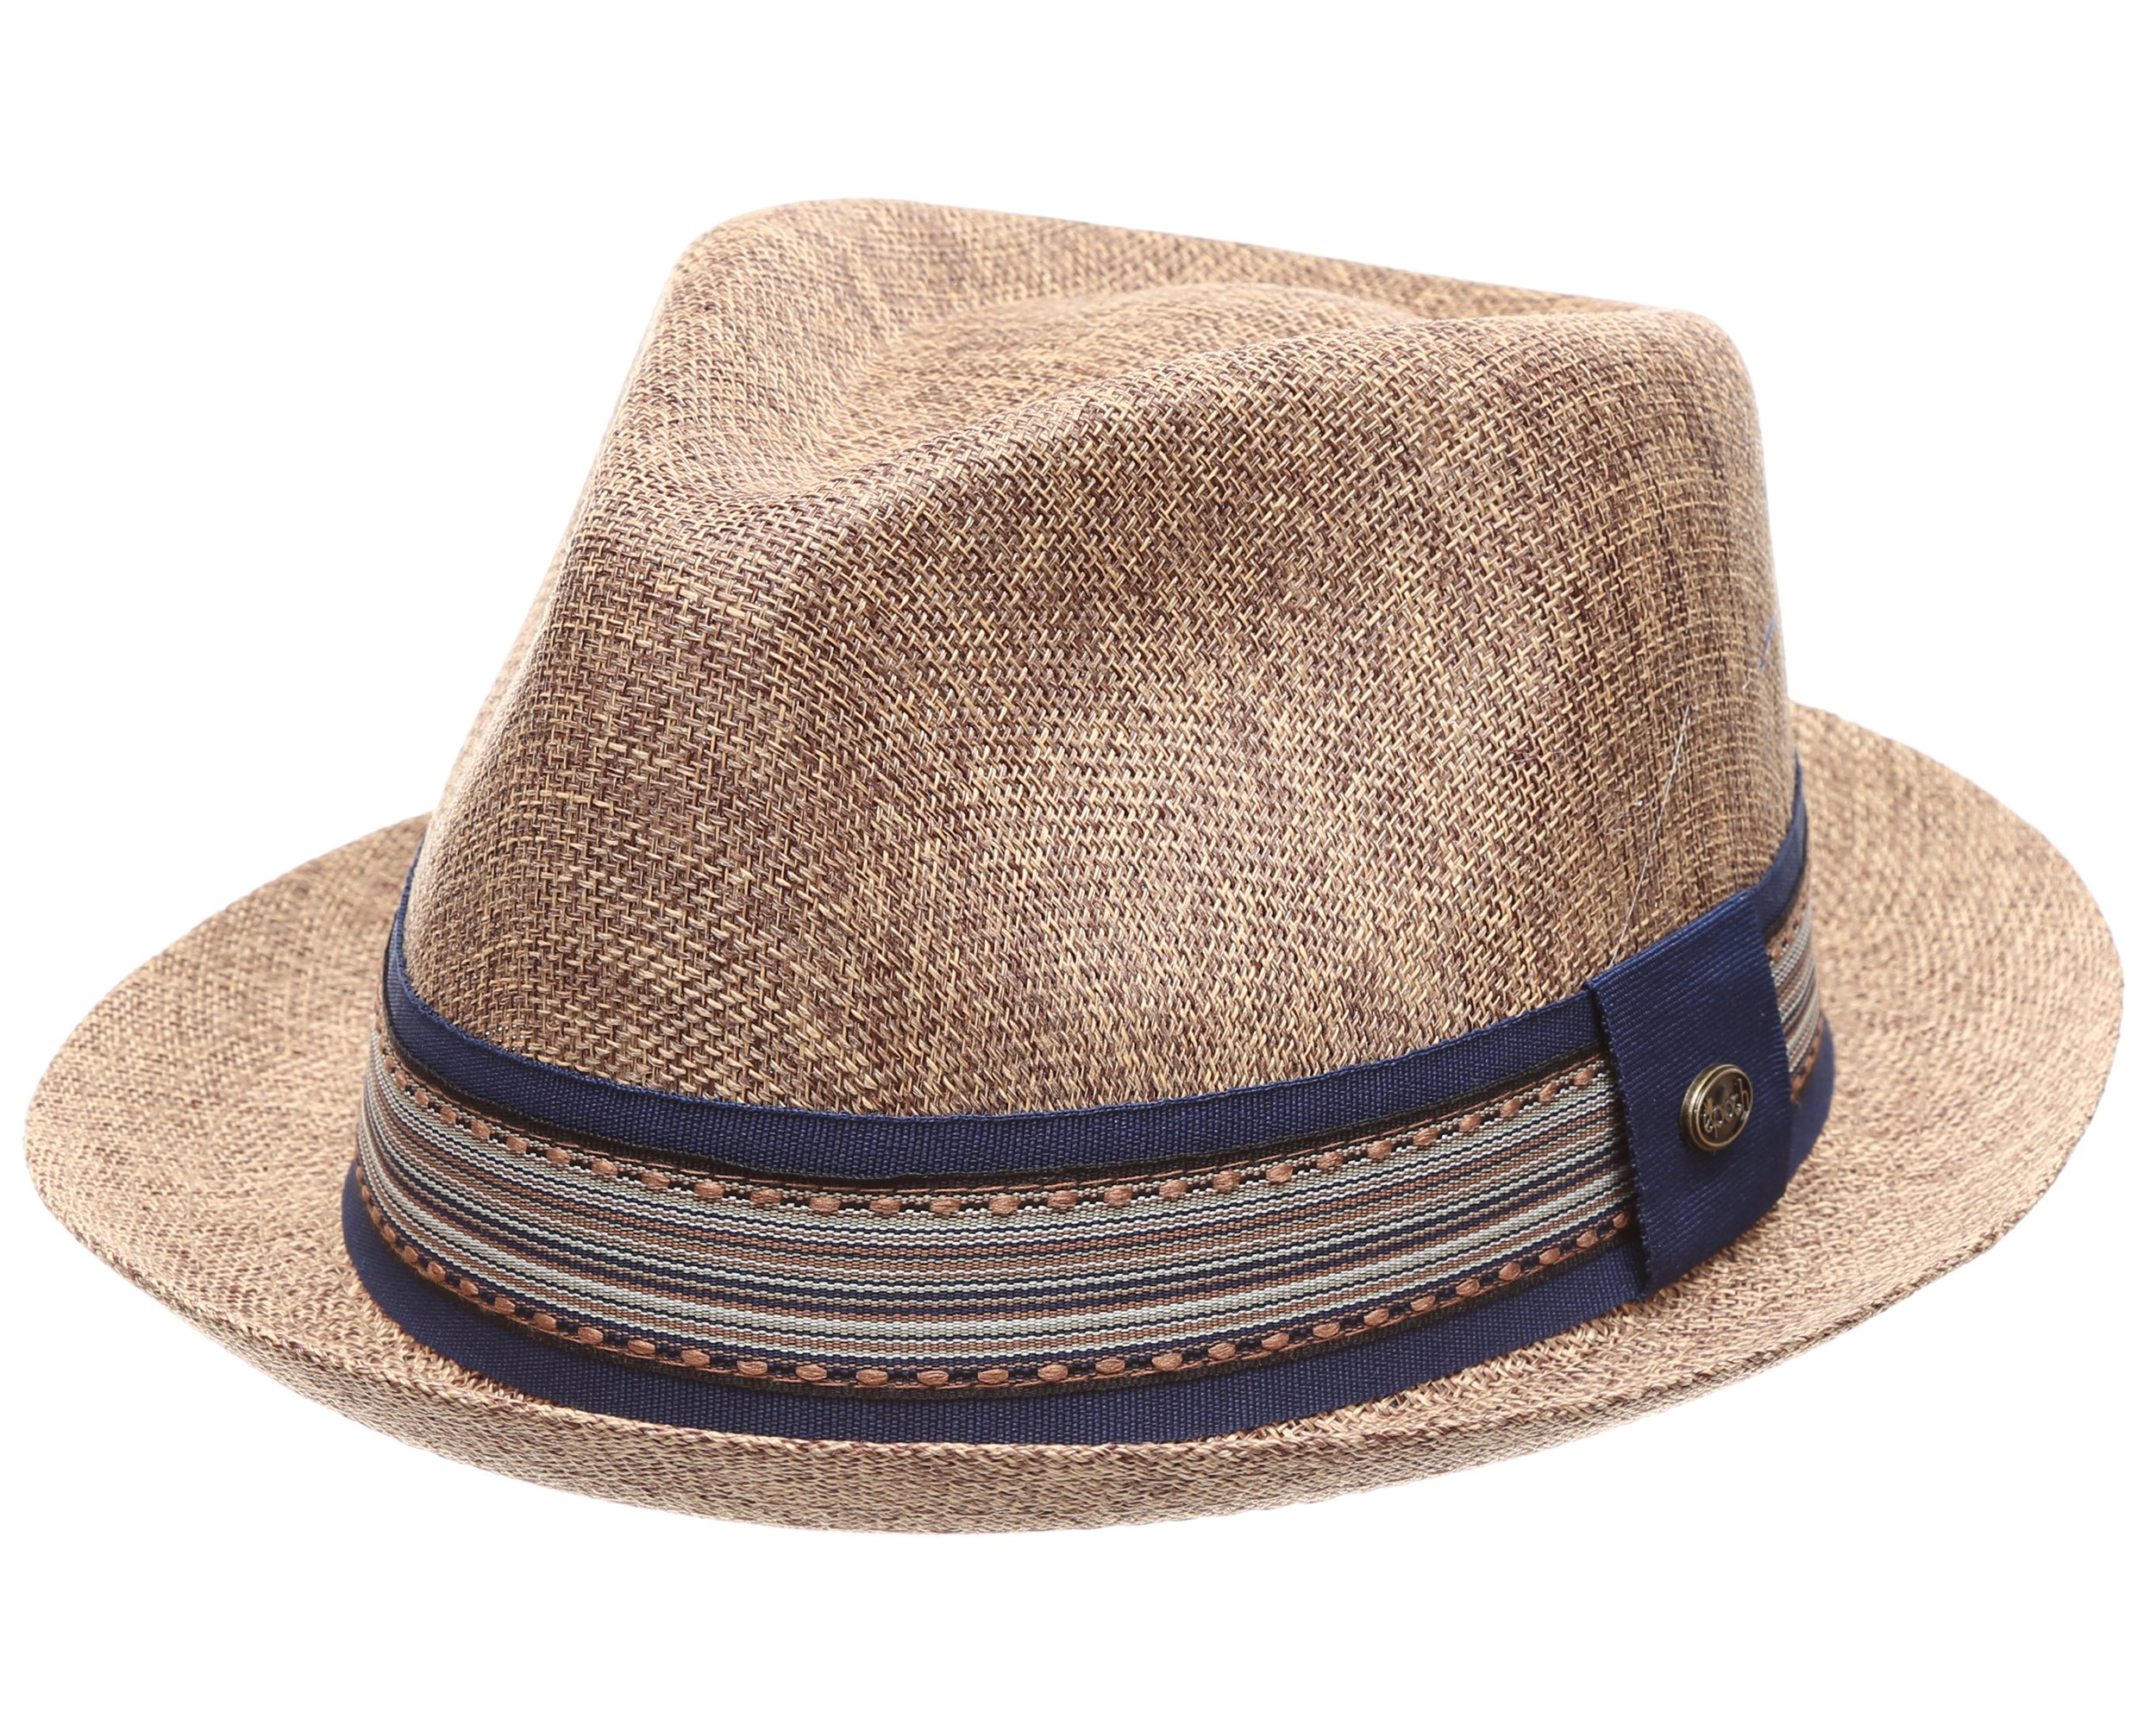 MIRMARU Men Women Summer Trilby Short Brim Lightweight Linen Fedora Hat with Band.(2805-Lt.Brown/LXL)